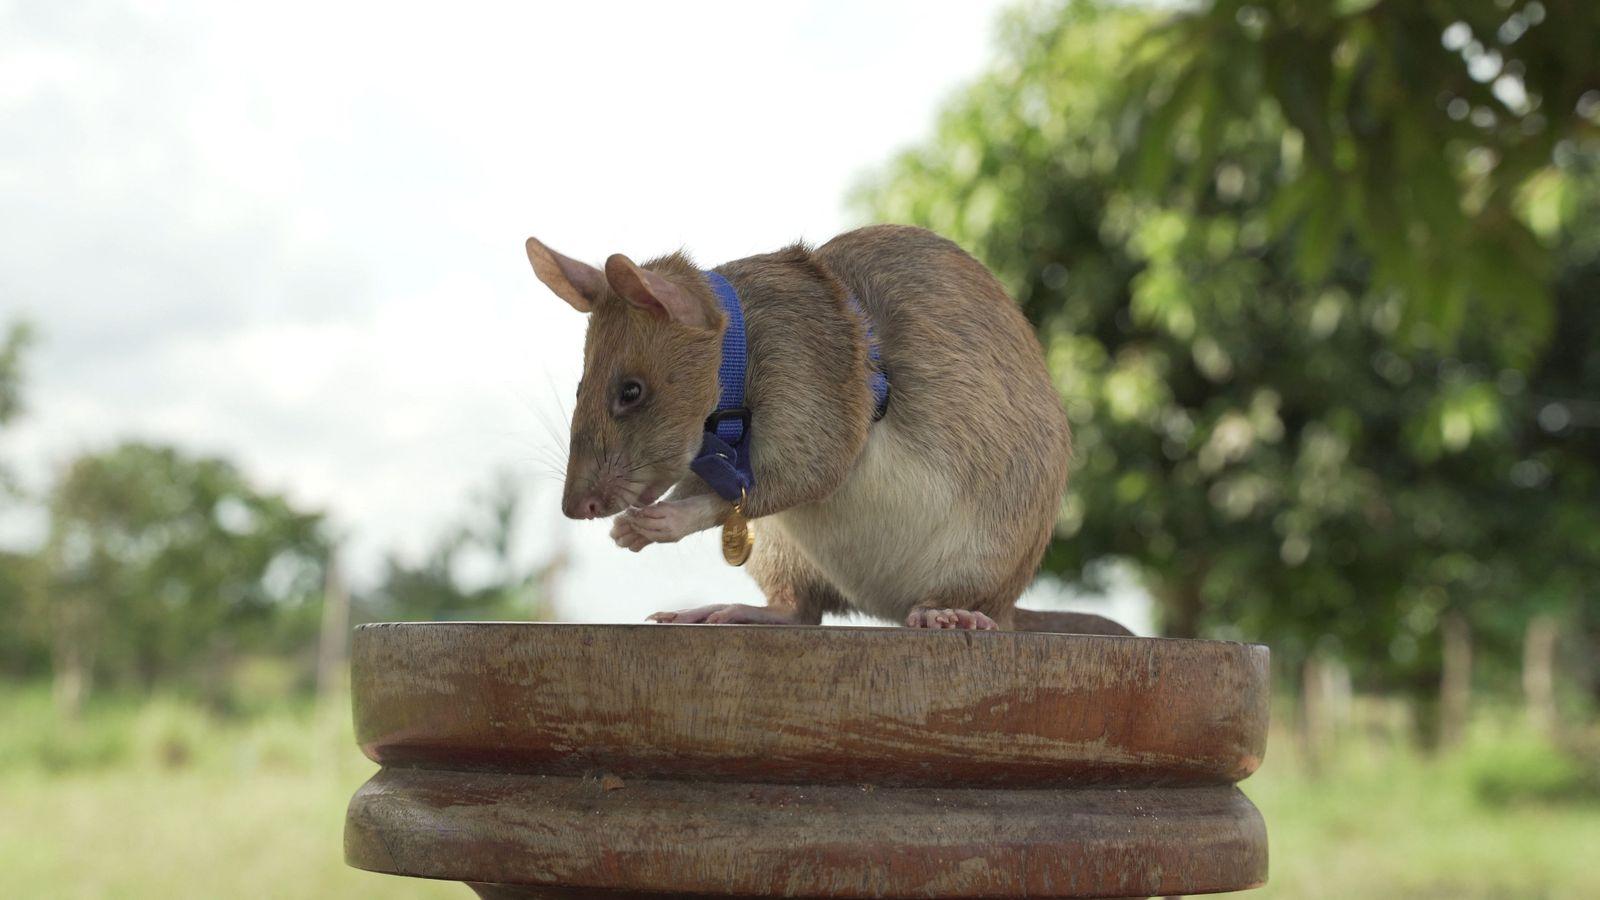 FILES-CAMBODIA-LANDMINES-ANIMAL-RAT-OFFBEAT